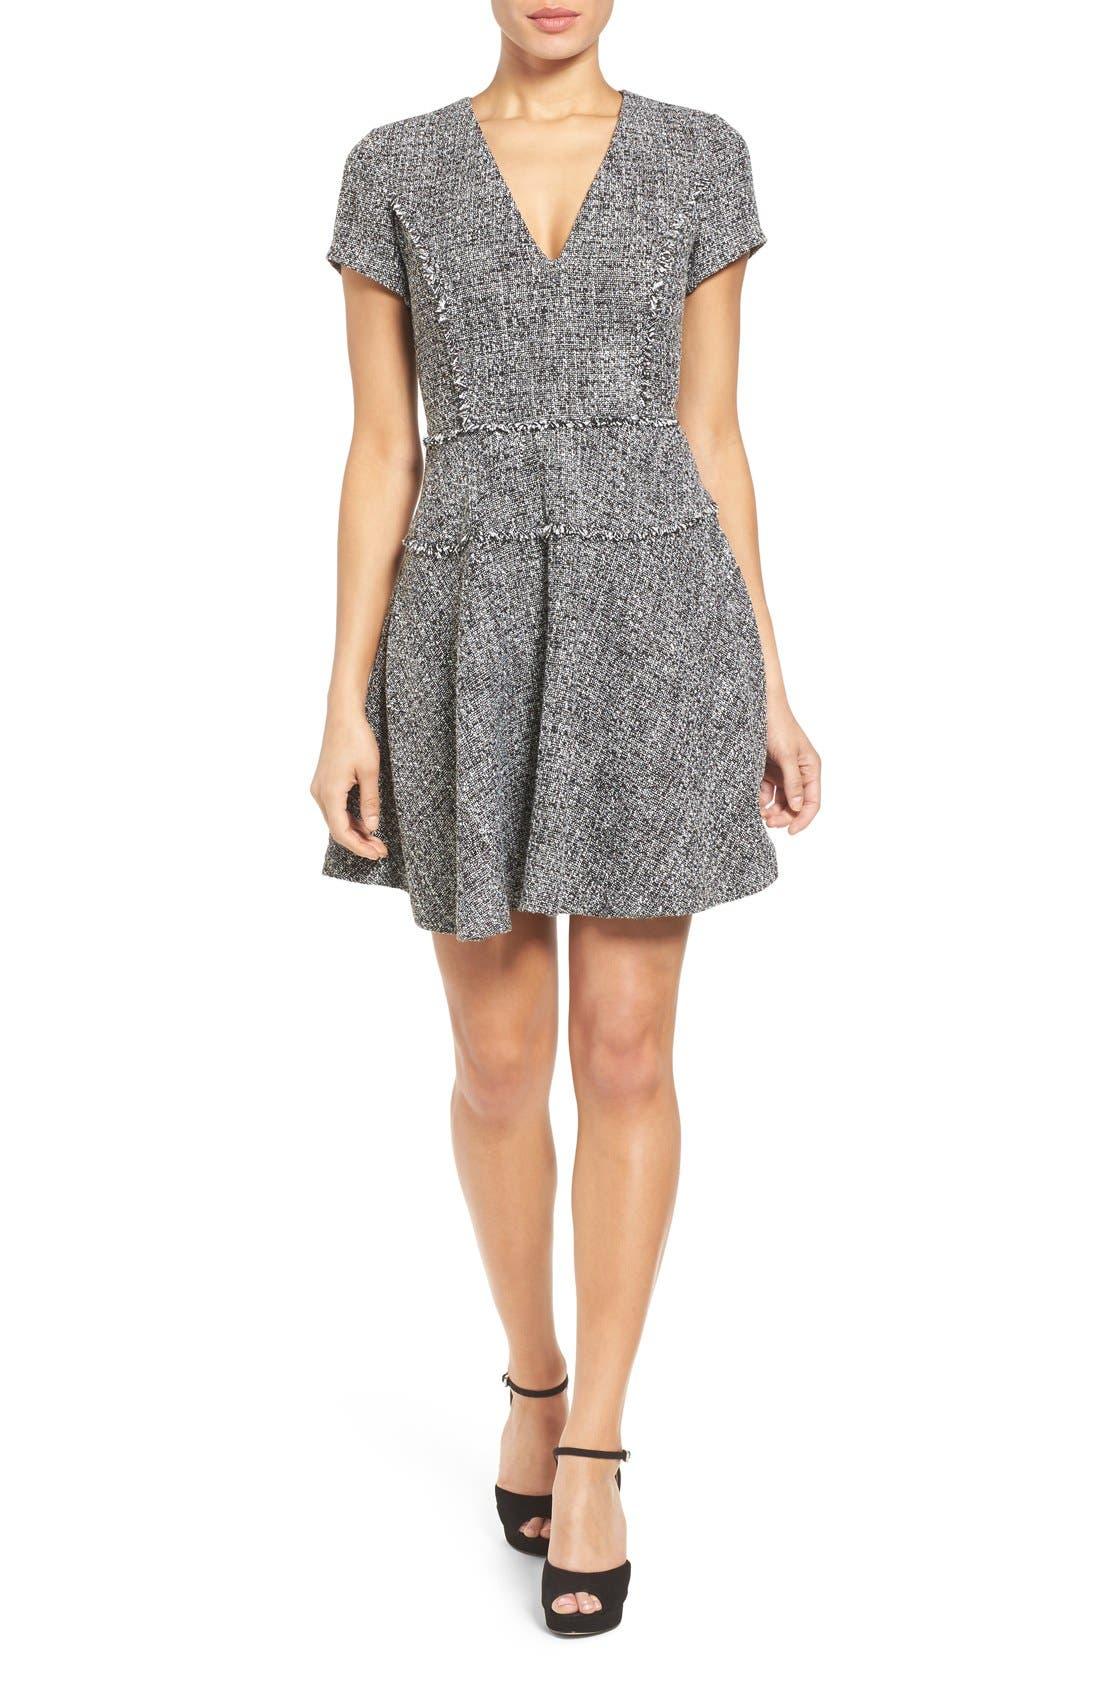 MICHAEL MICHAEL KORS Tweed Fit & Flare Dress, Main, color, 001